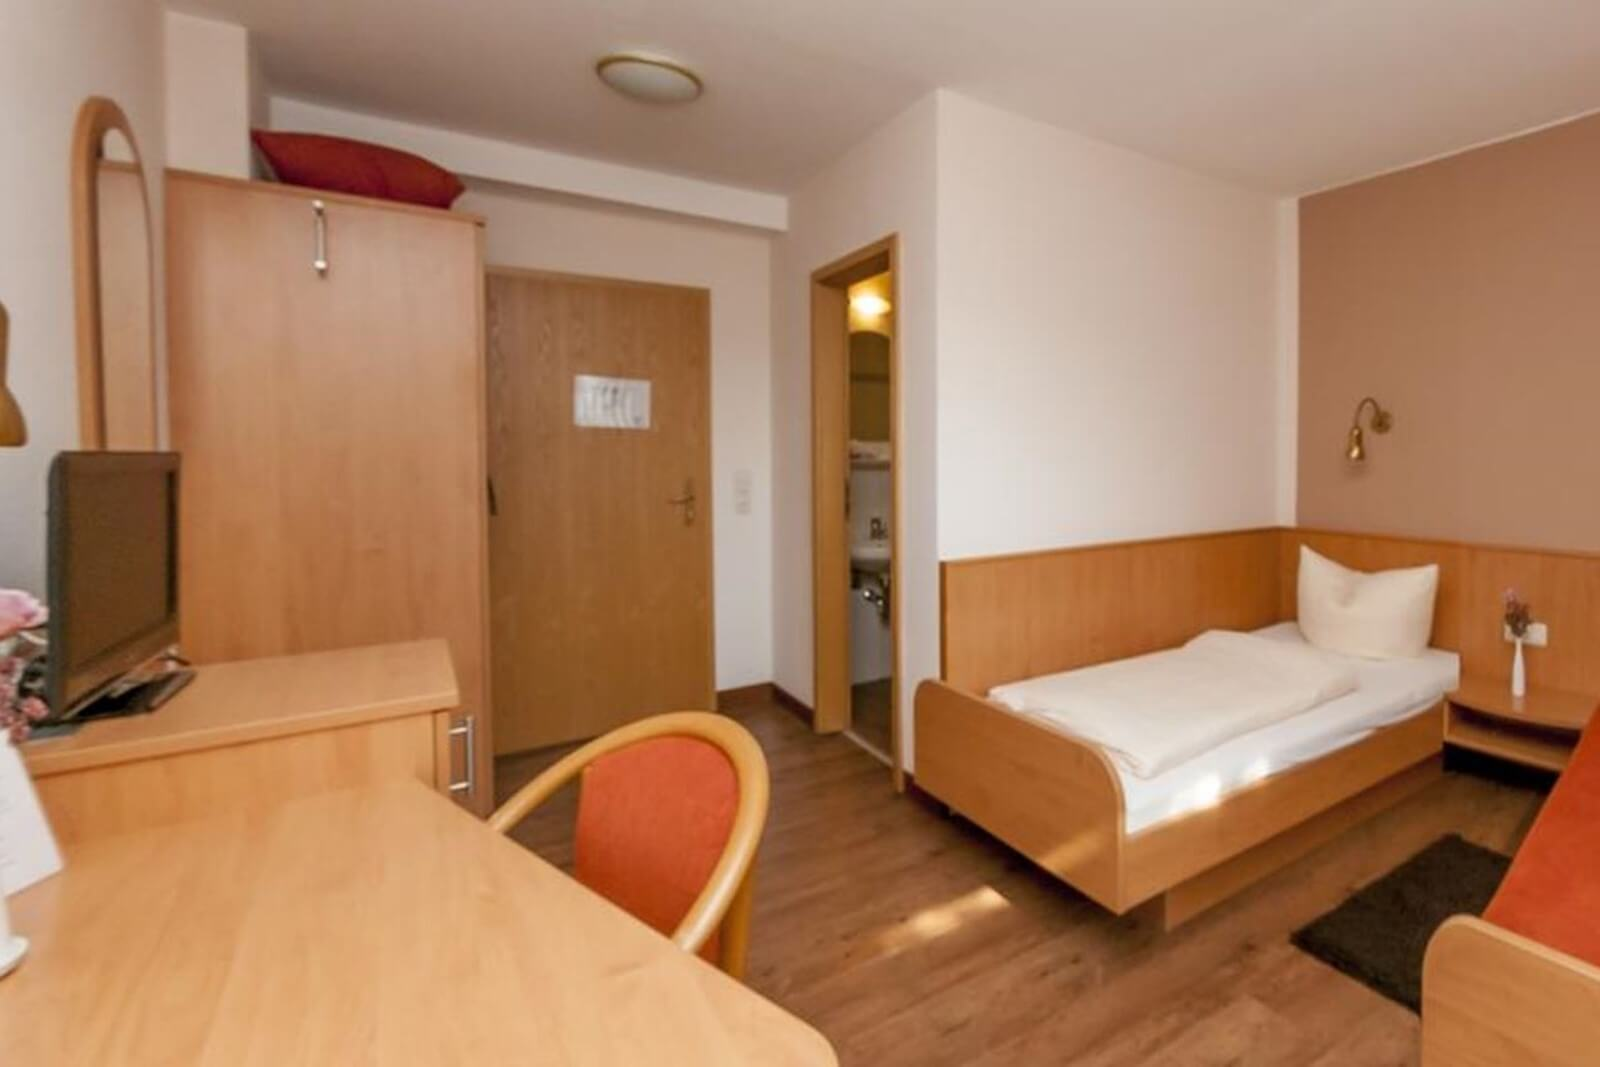 einzelzimmer-komfort-hotel-pension-bett-fruehstueck-riedstadt